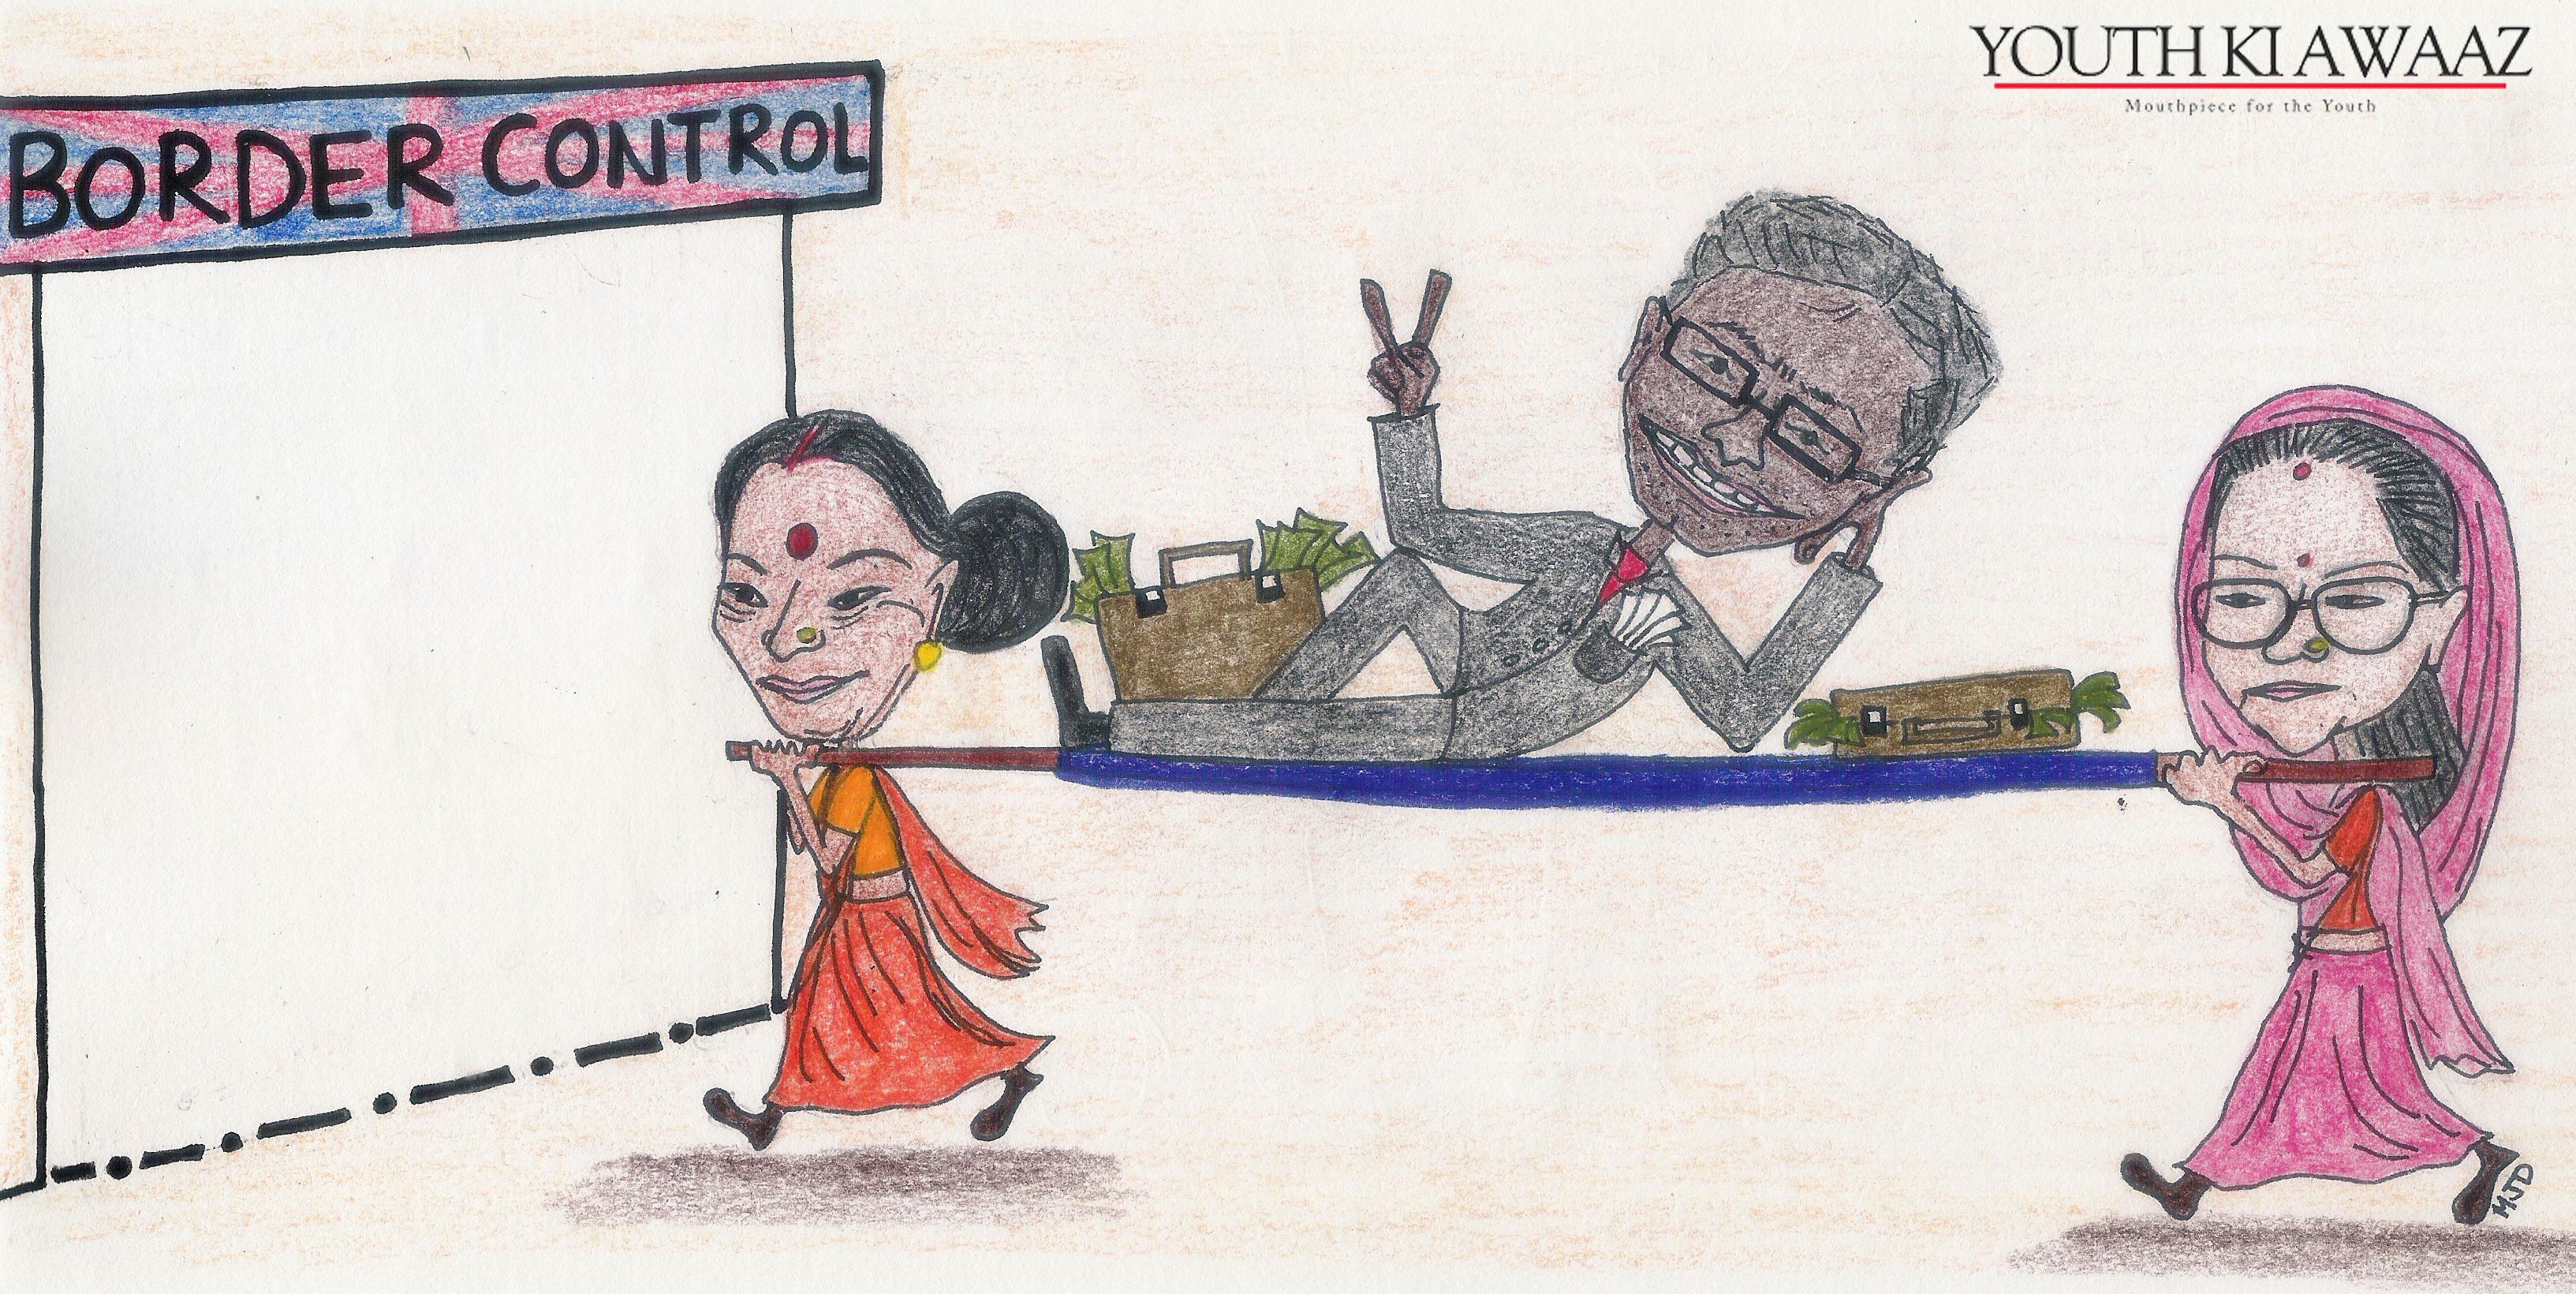 maitri dore lalit modi sushma swaraj vasundhara raje